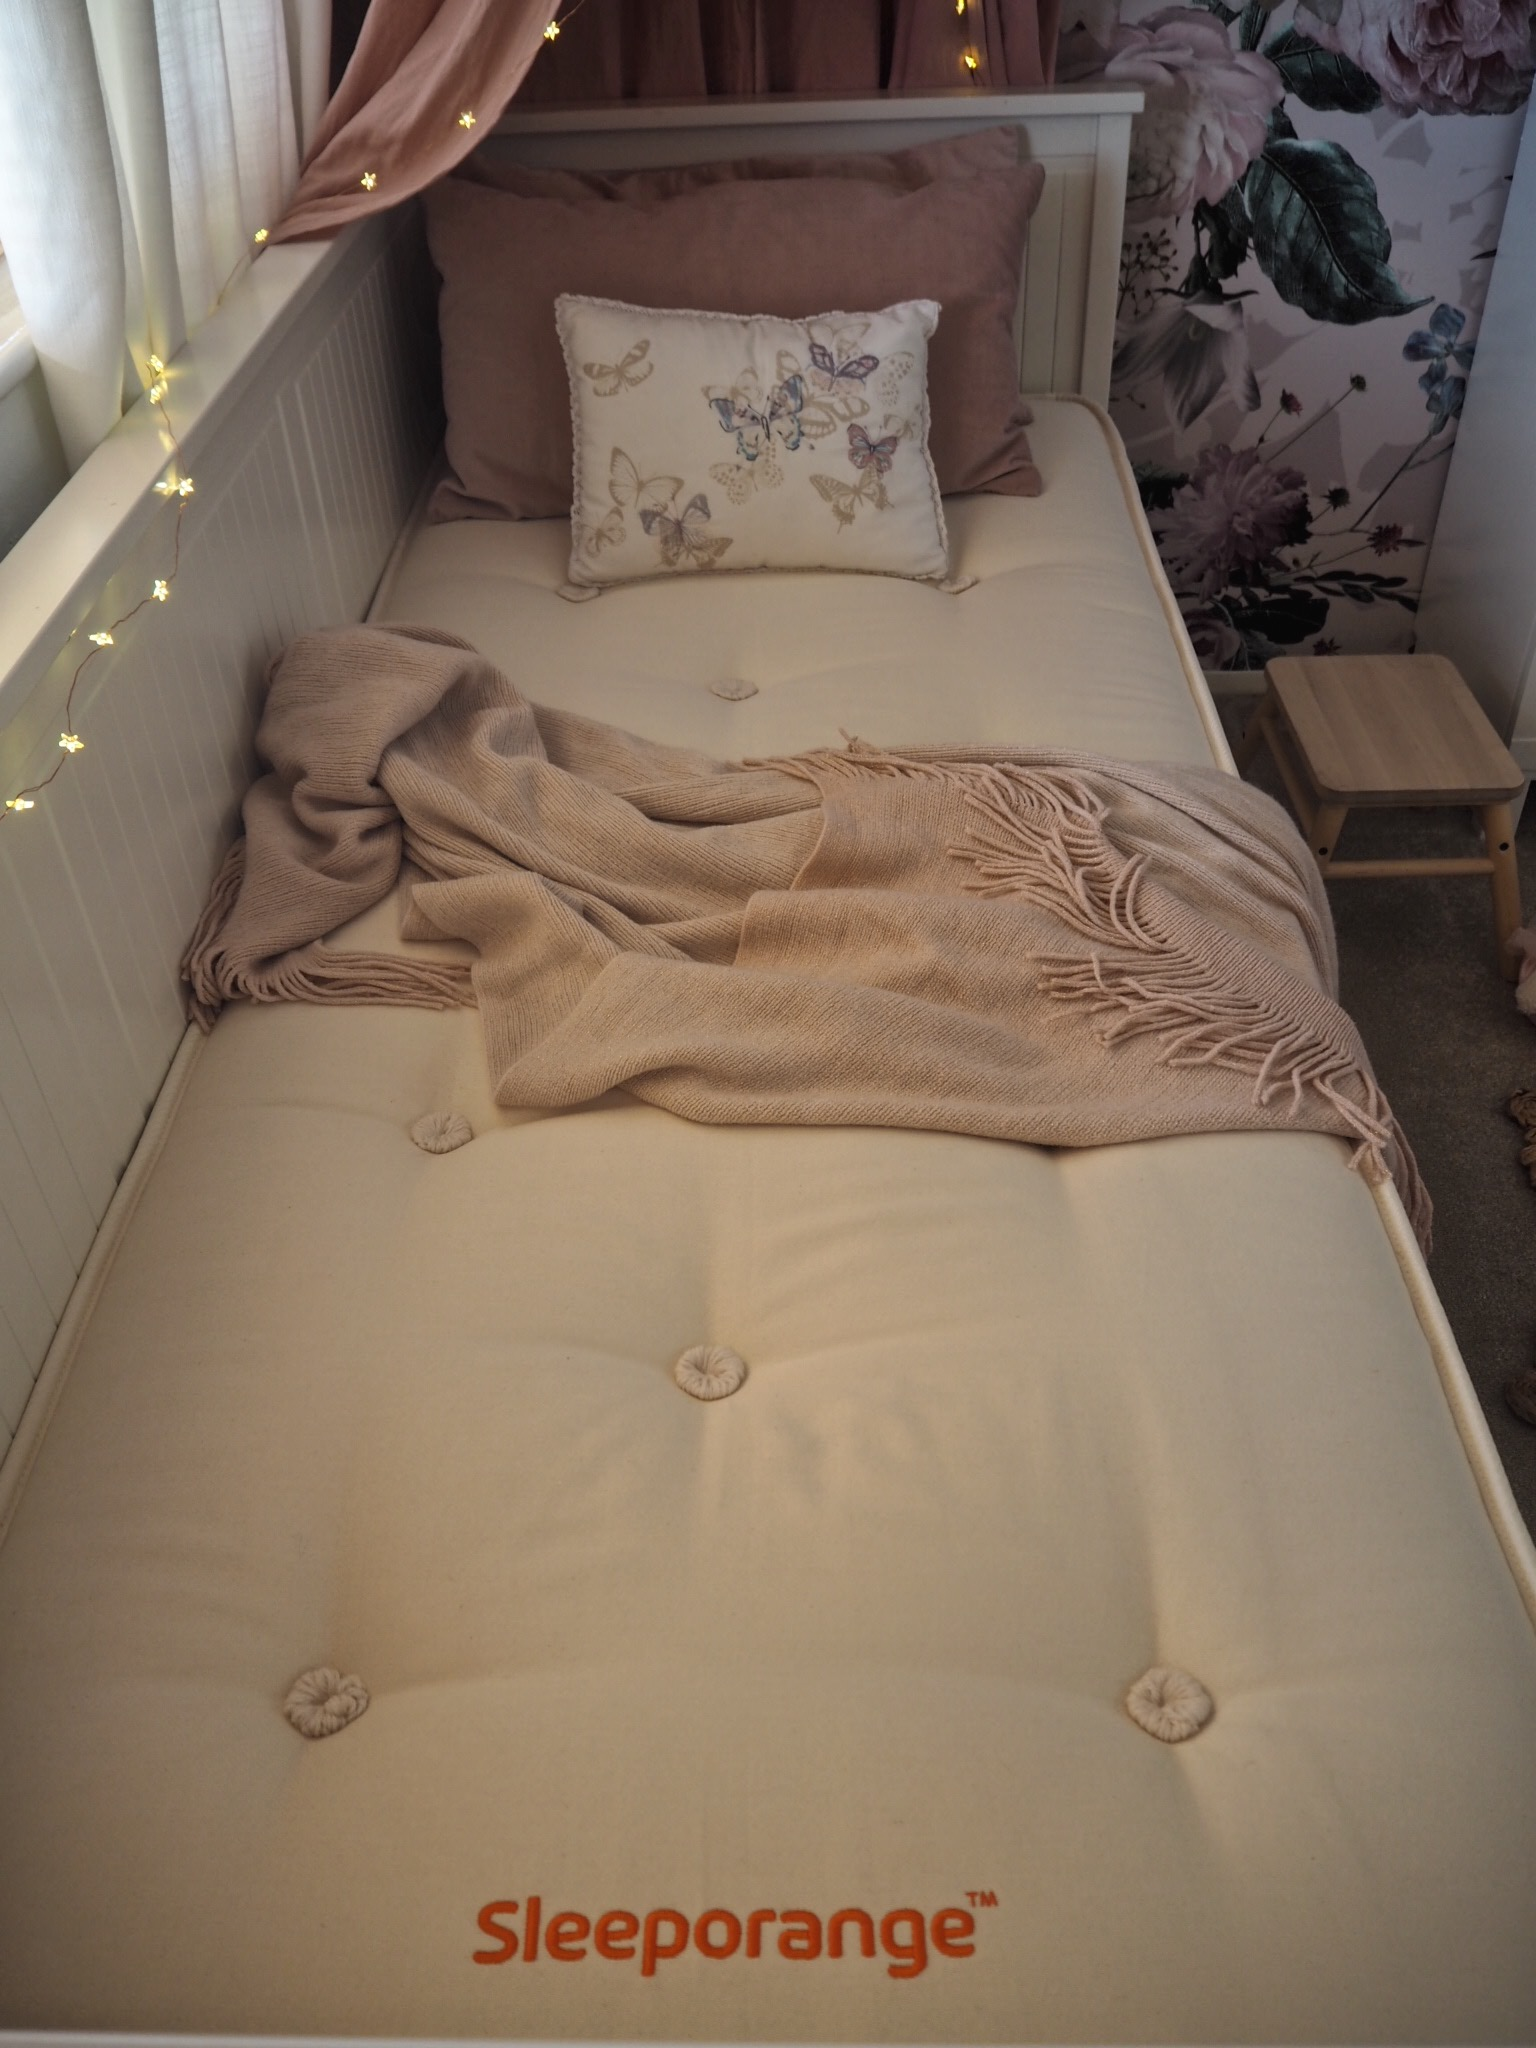 The new  SleepOrange  mattress